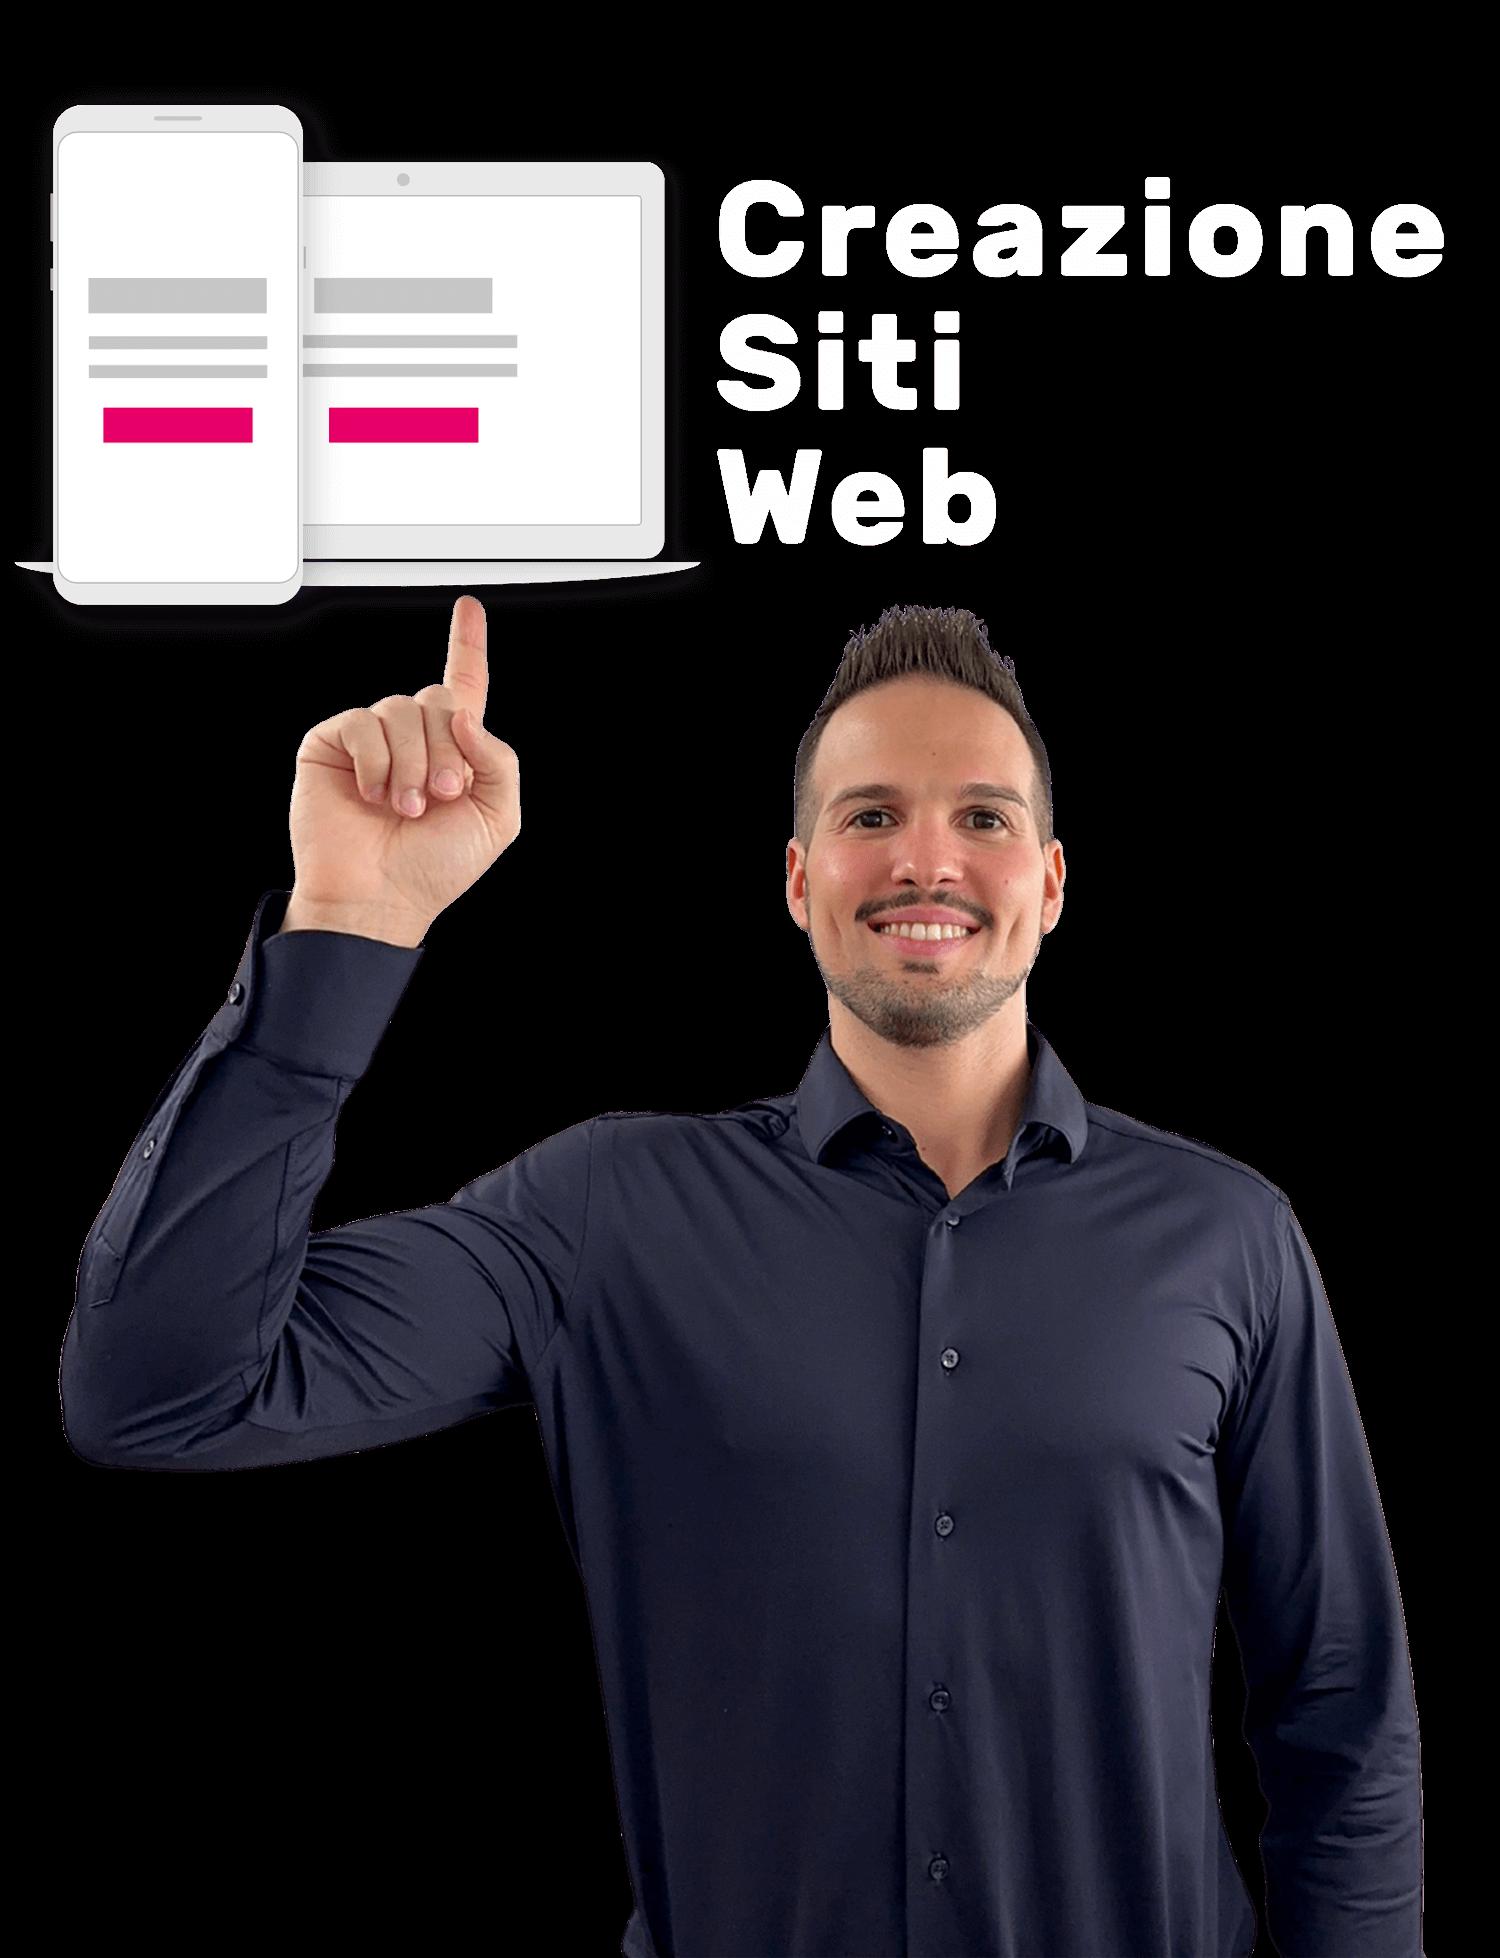 Davide-Armari-Creazione-Siti-Web-1